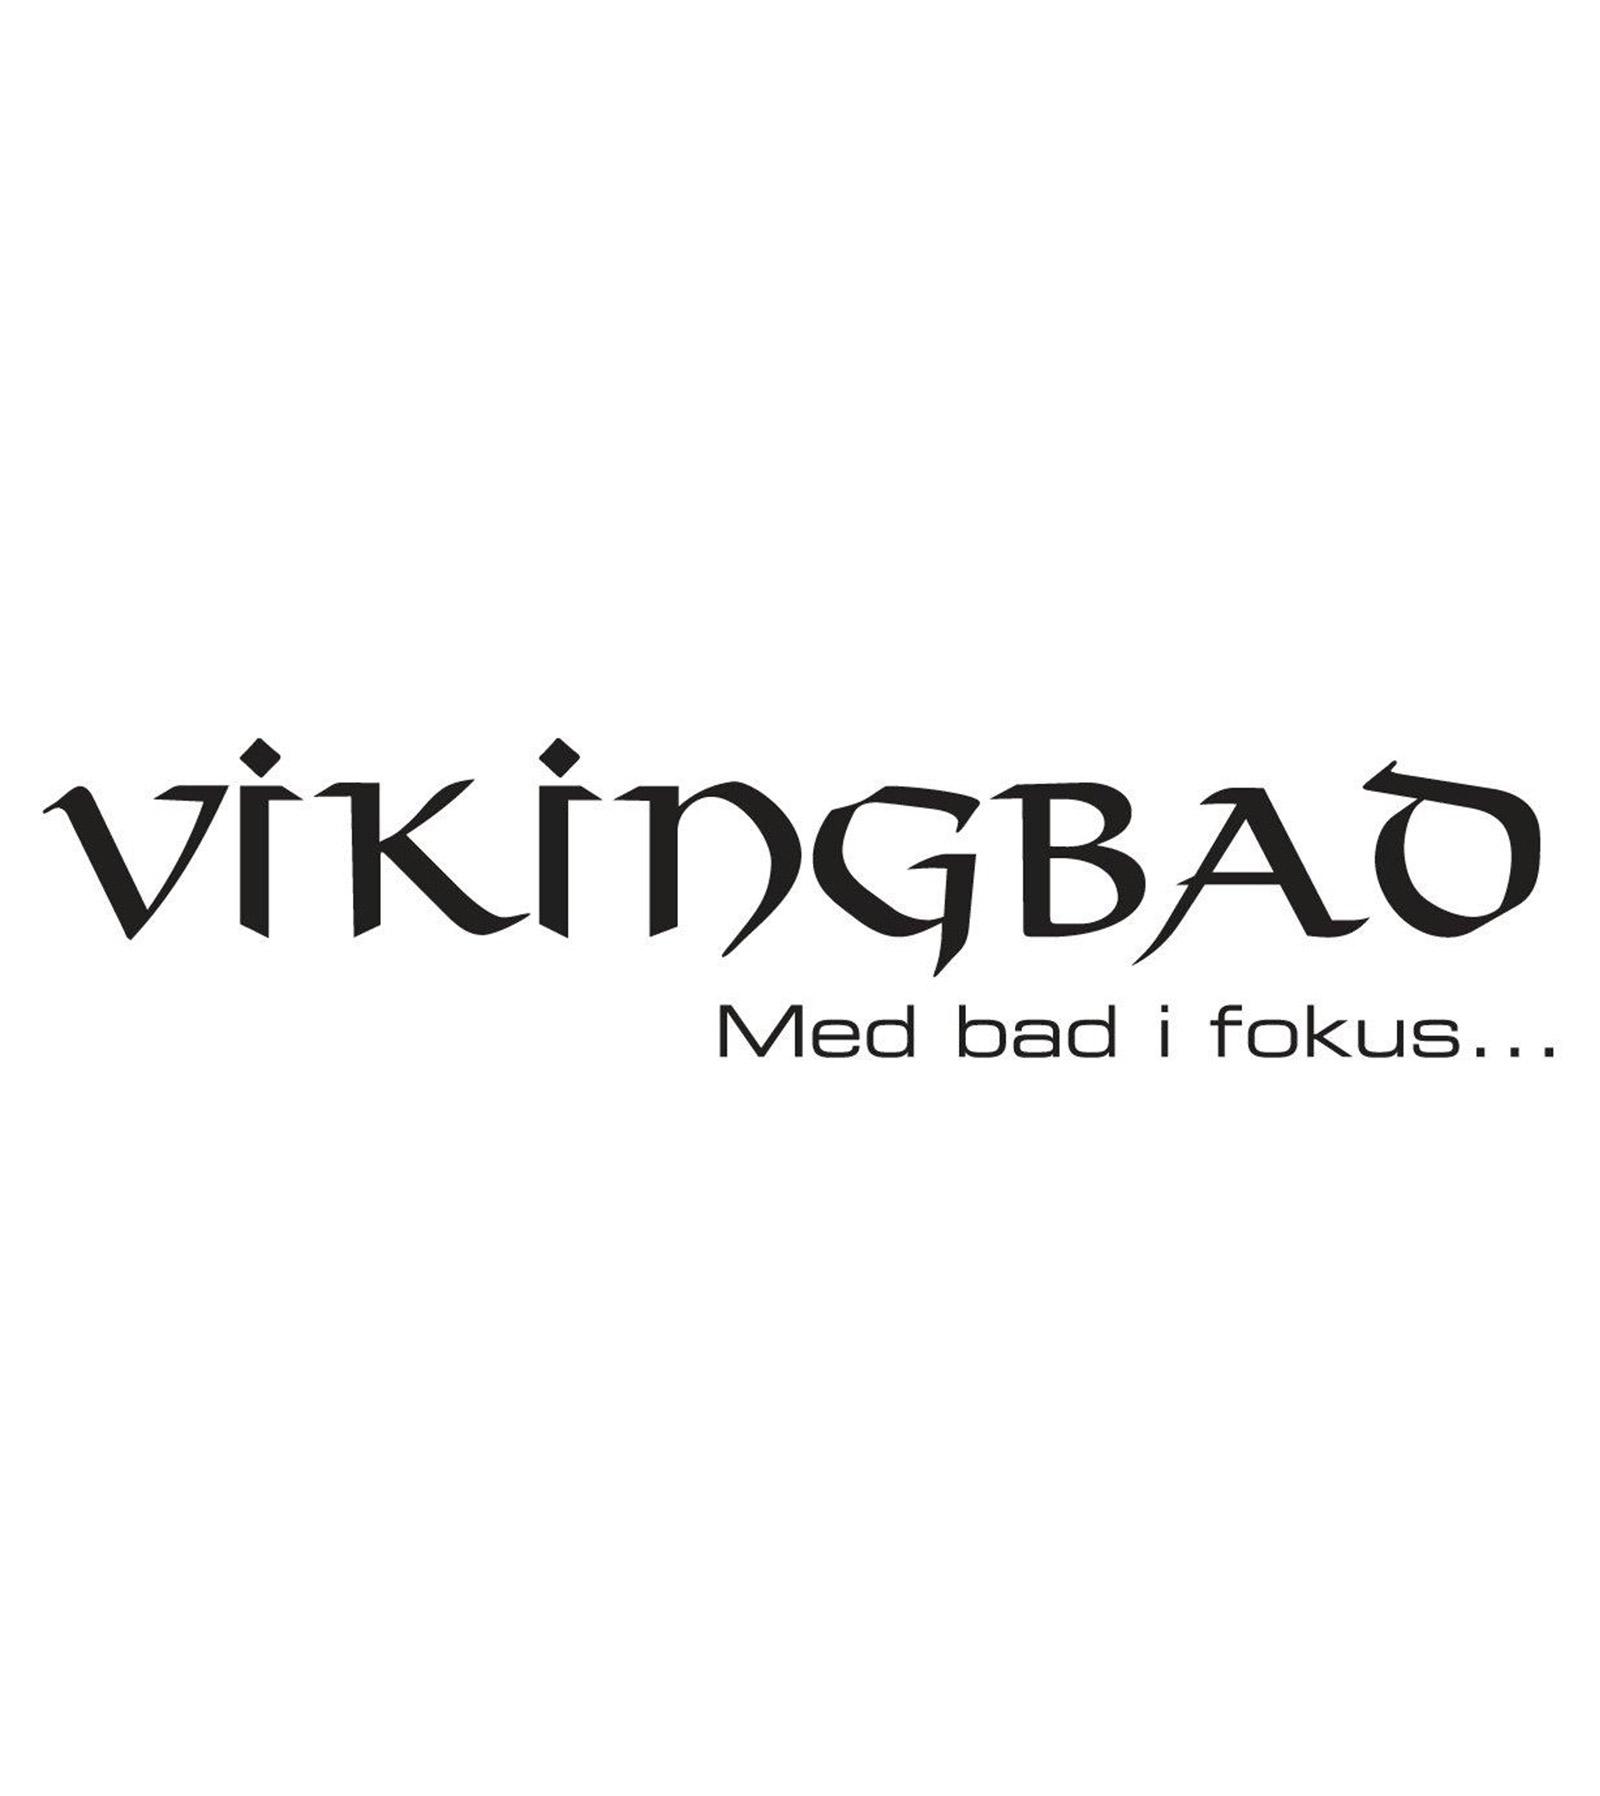 vikingbad.jpg